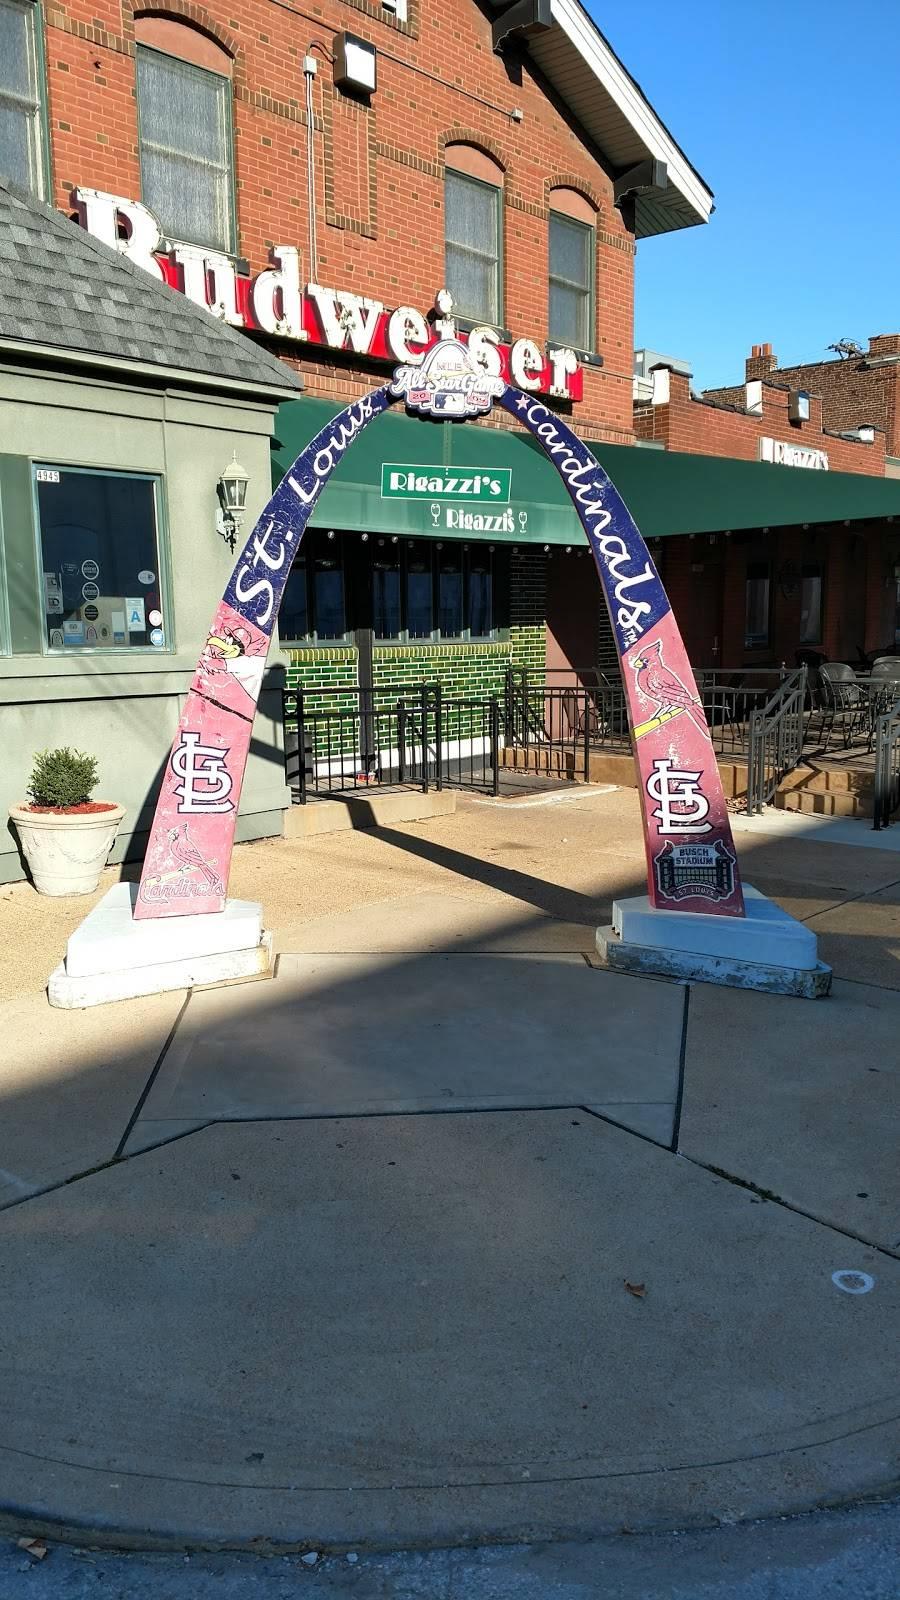 Rigazzis - restaurant  | Photo 1 of 10 | Address: 4945 Daggett Ave, St. Louis, MO 63110, USA | Phone: (314) 772-4900